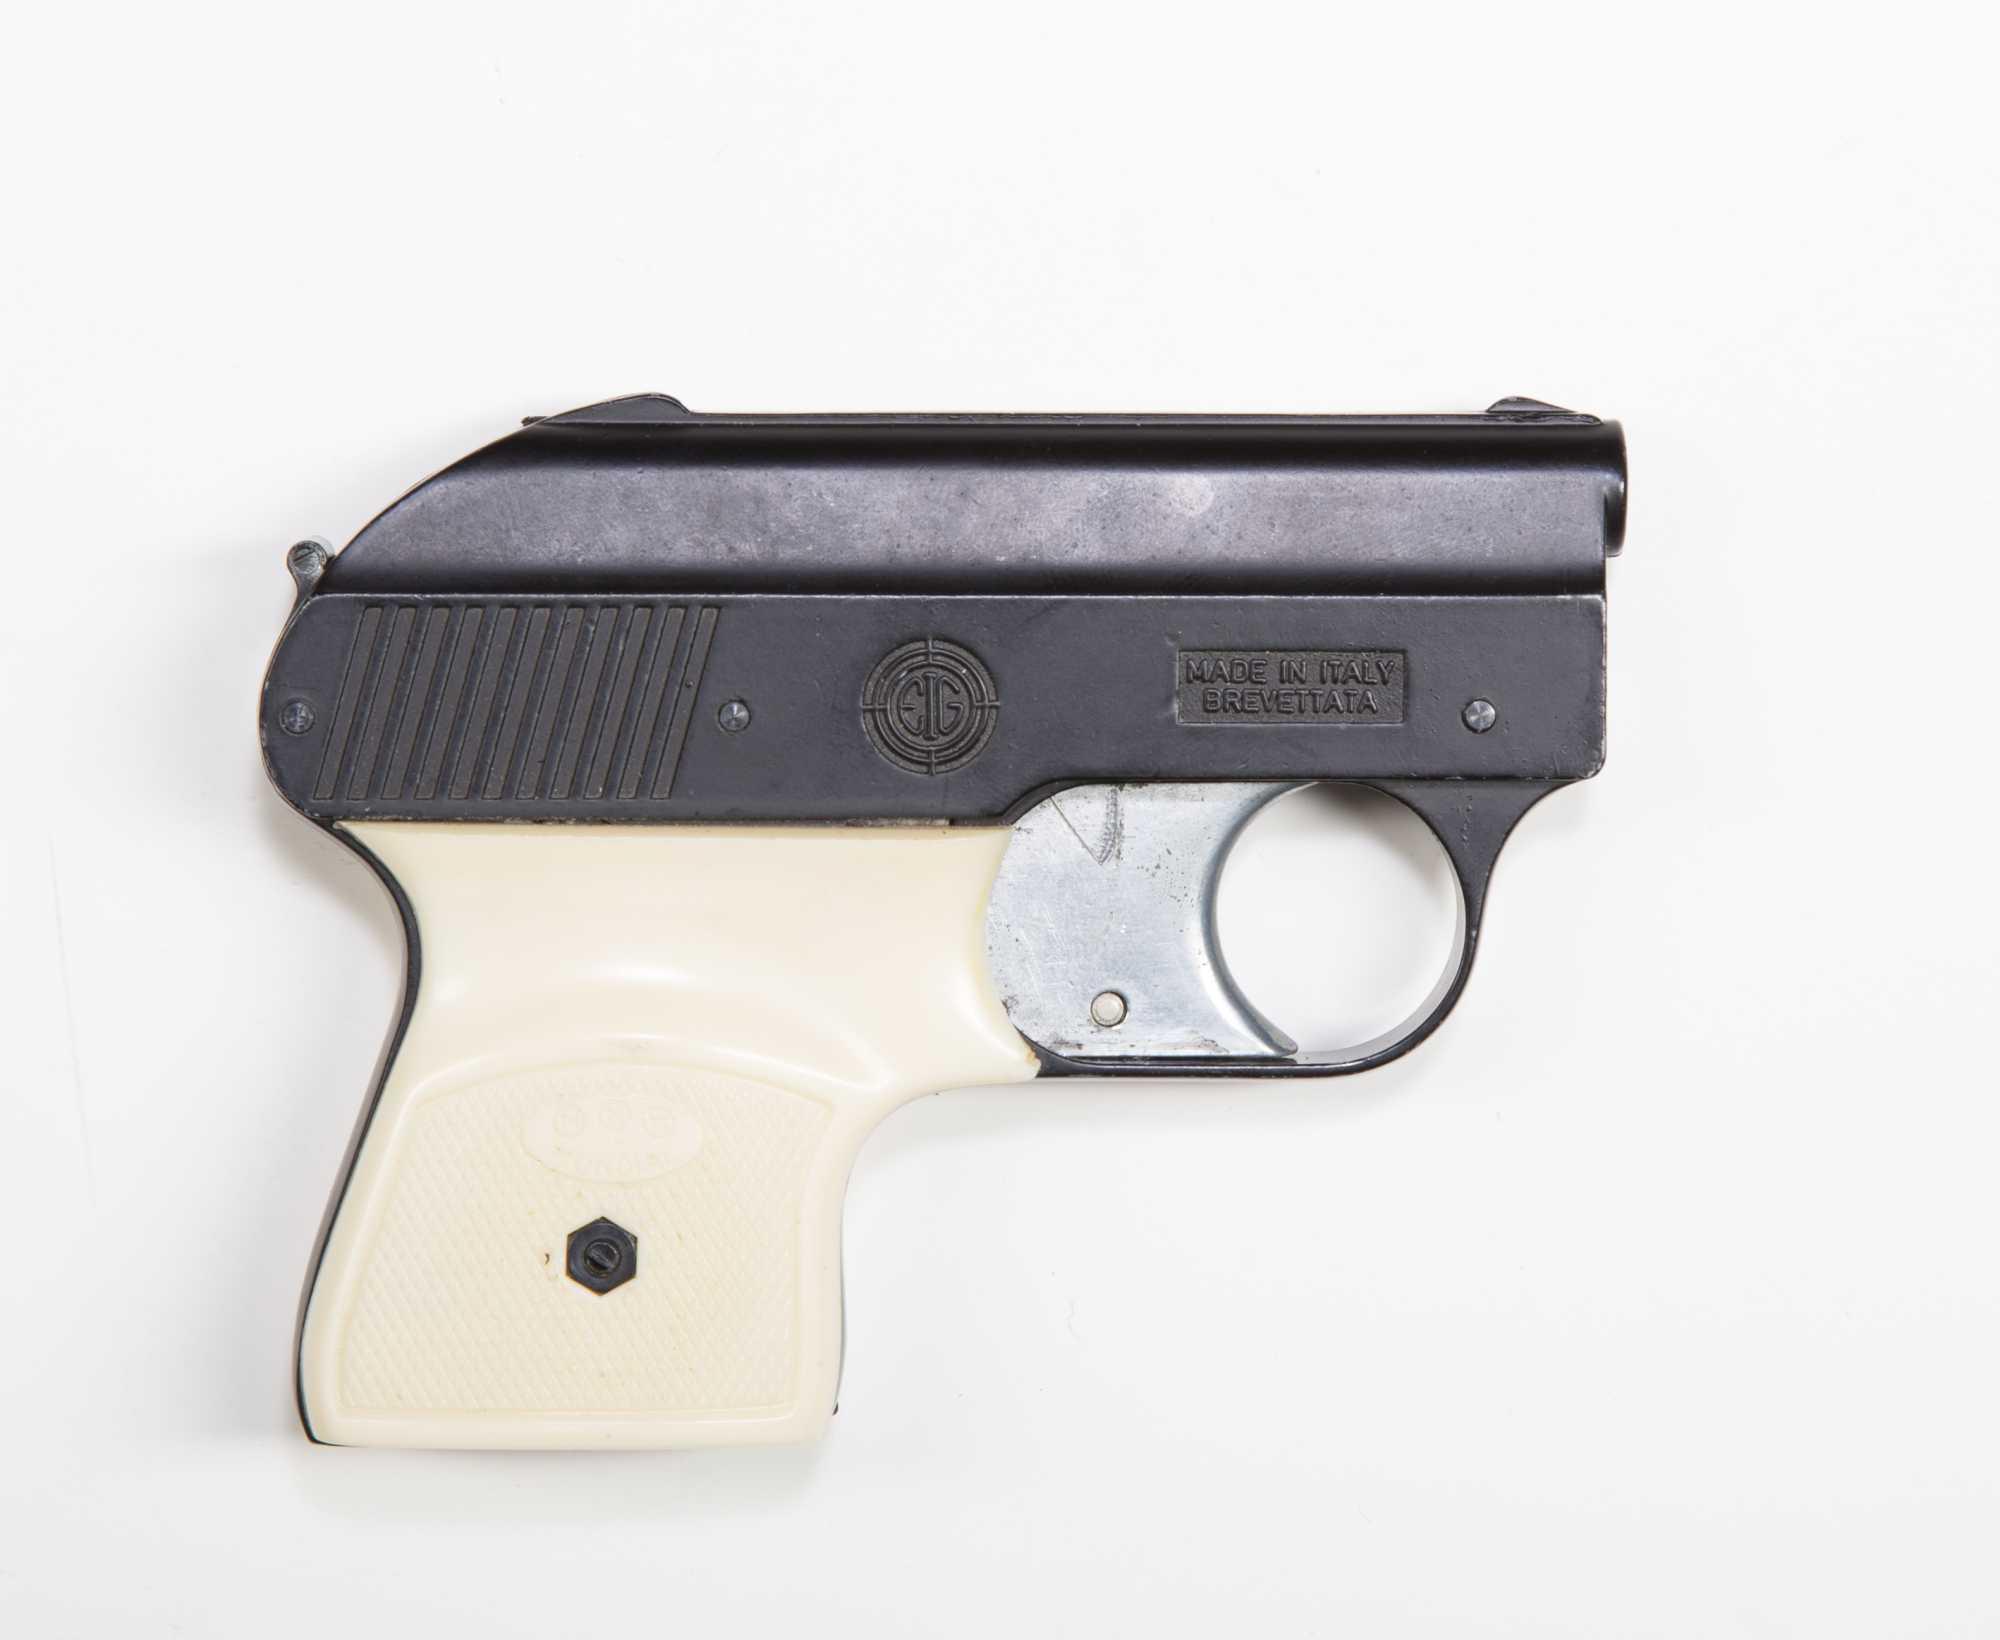 "Auction Auto Usa >> Mondial Brevettata .22 auto pistol, model 1900, works with .22 cal crimped blank ""flobert"" bullets"